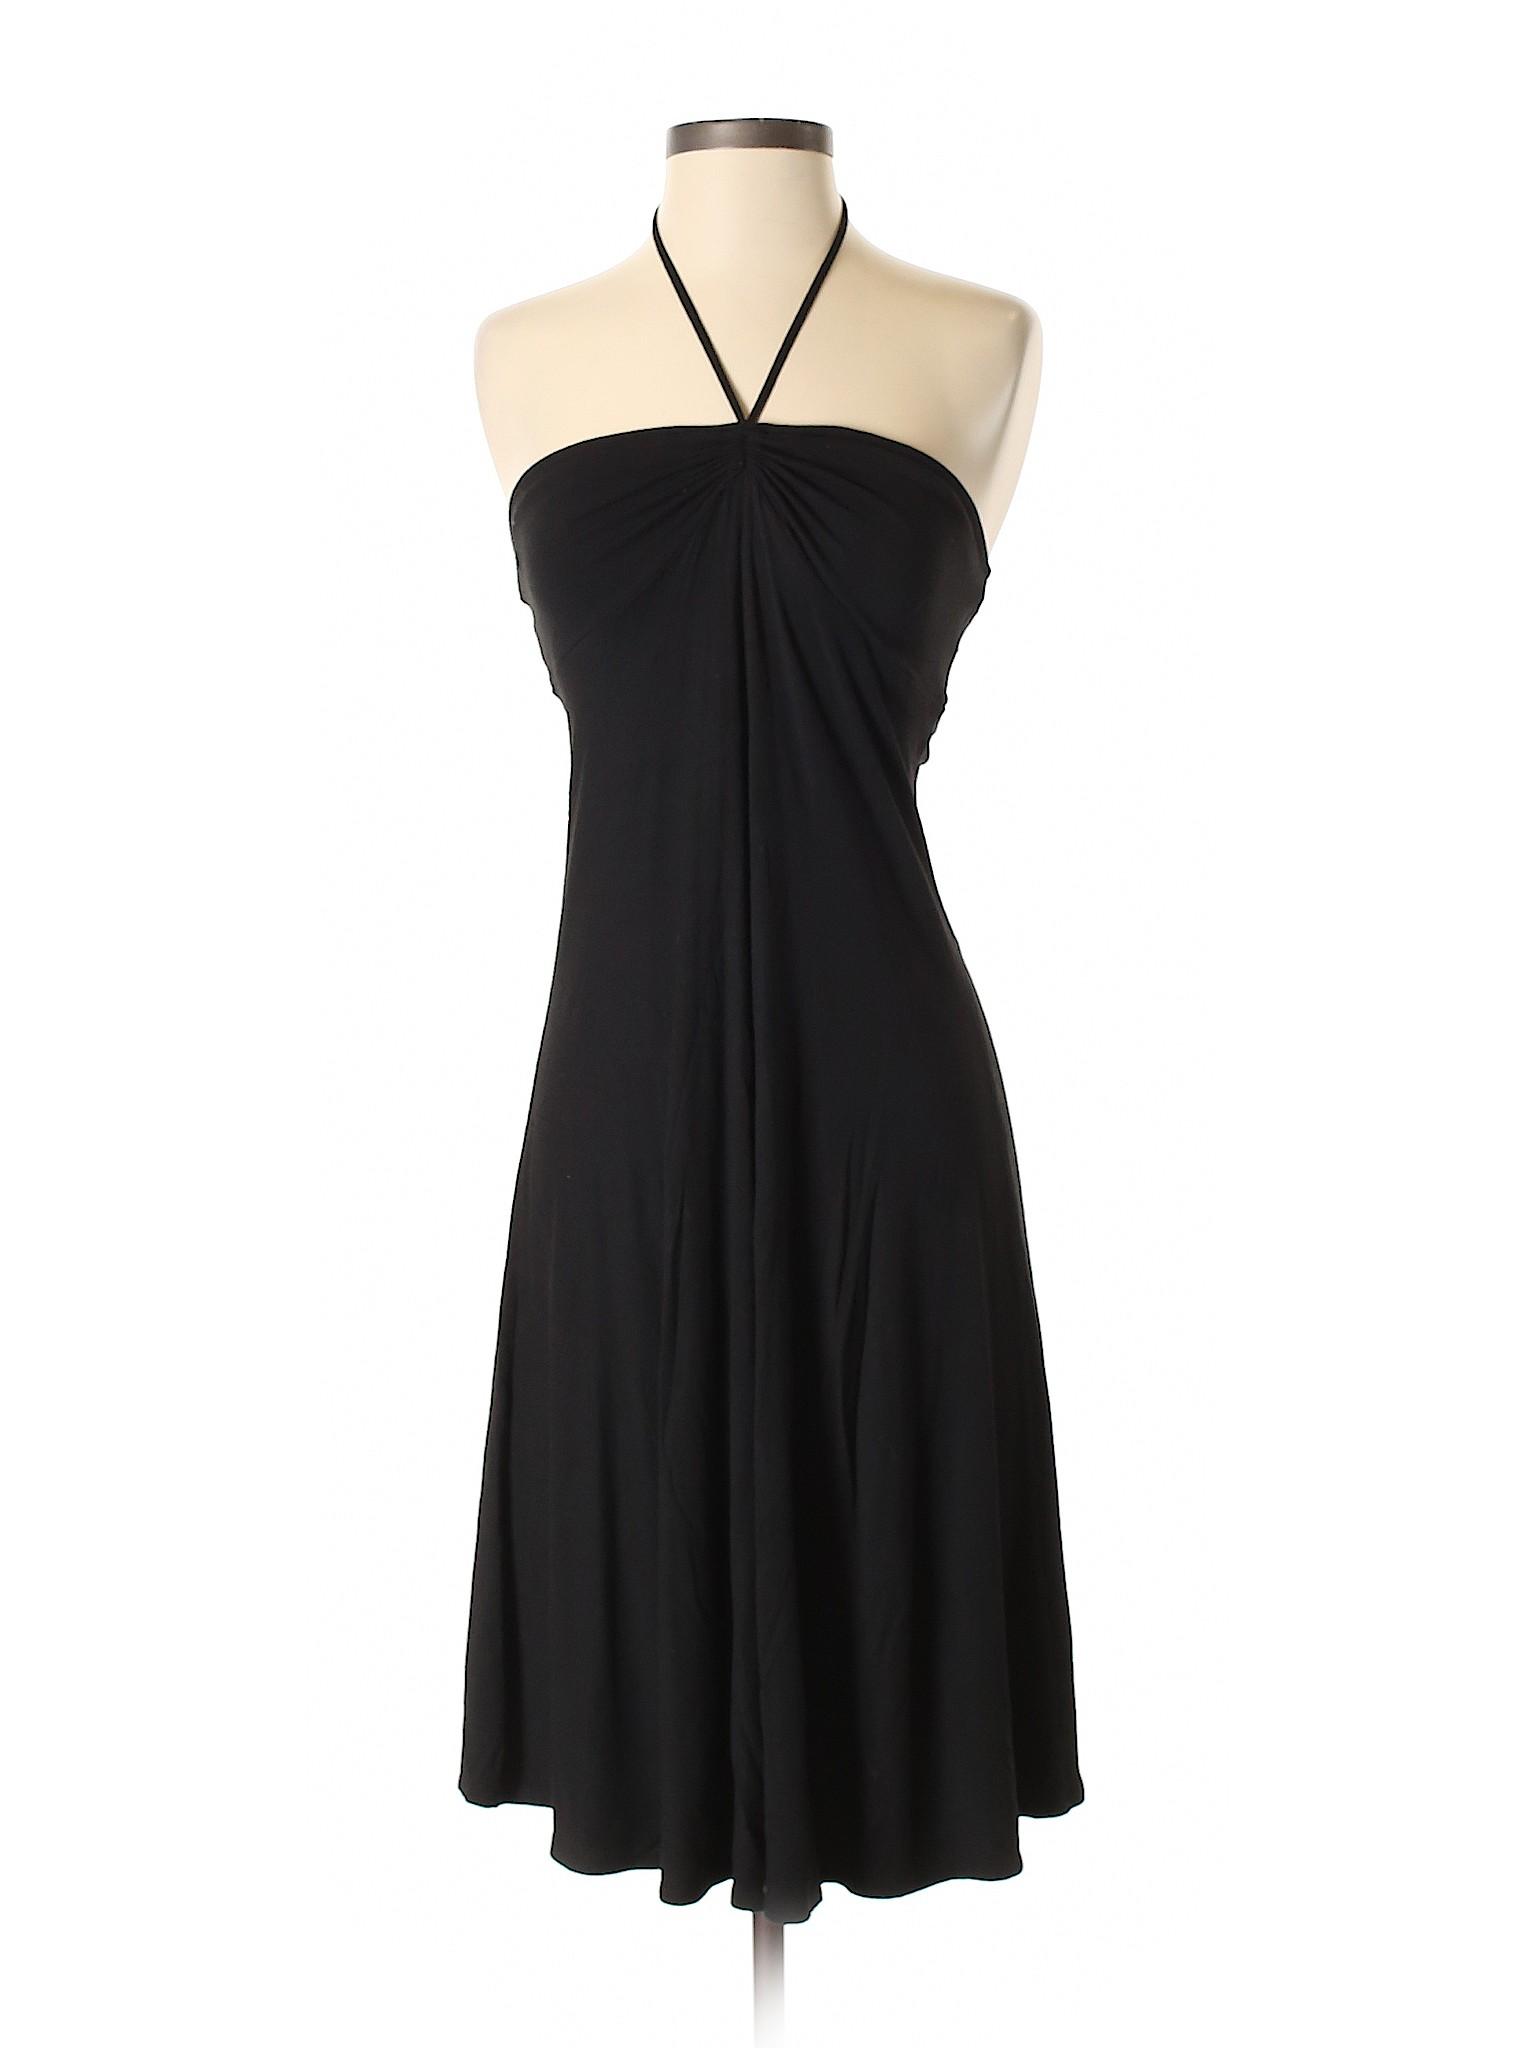 Selling Casual Dress amp; York New Company vIzSrwvq